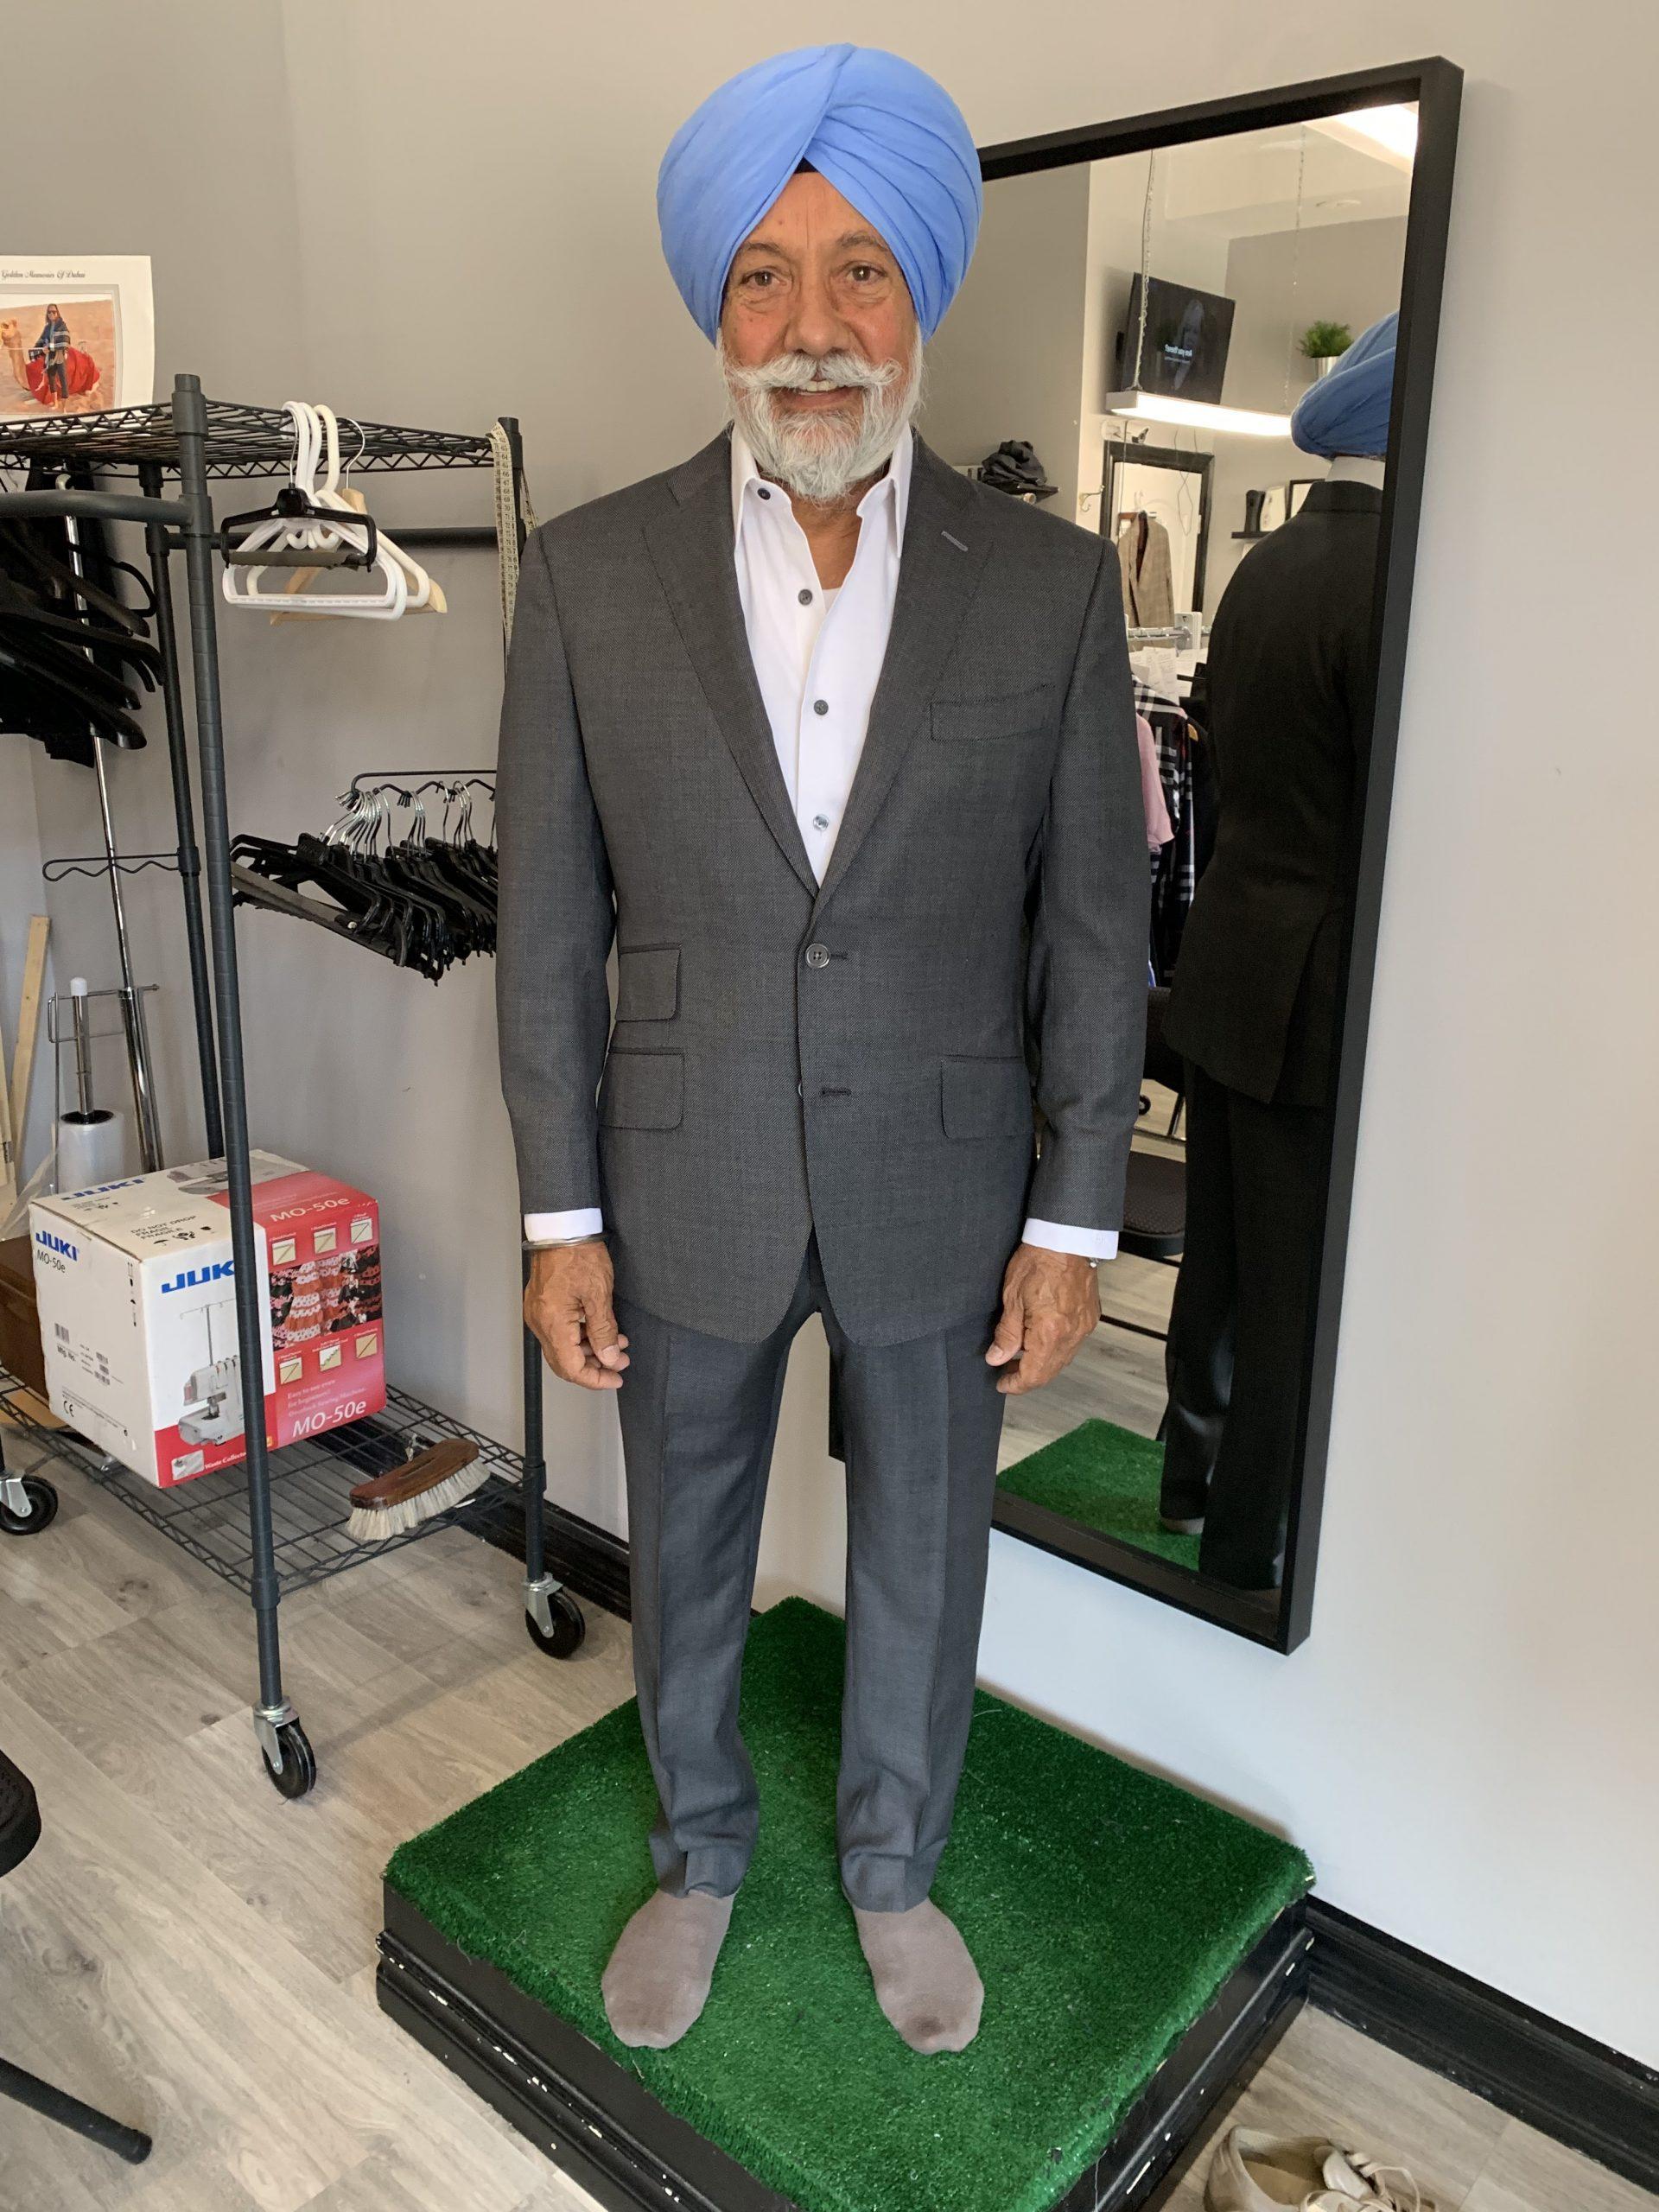 Andersonn Bespoke Suit Fitting in Brampton